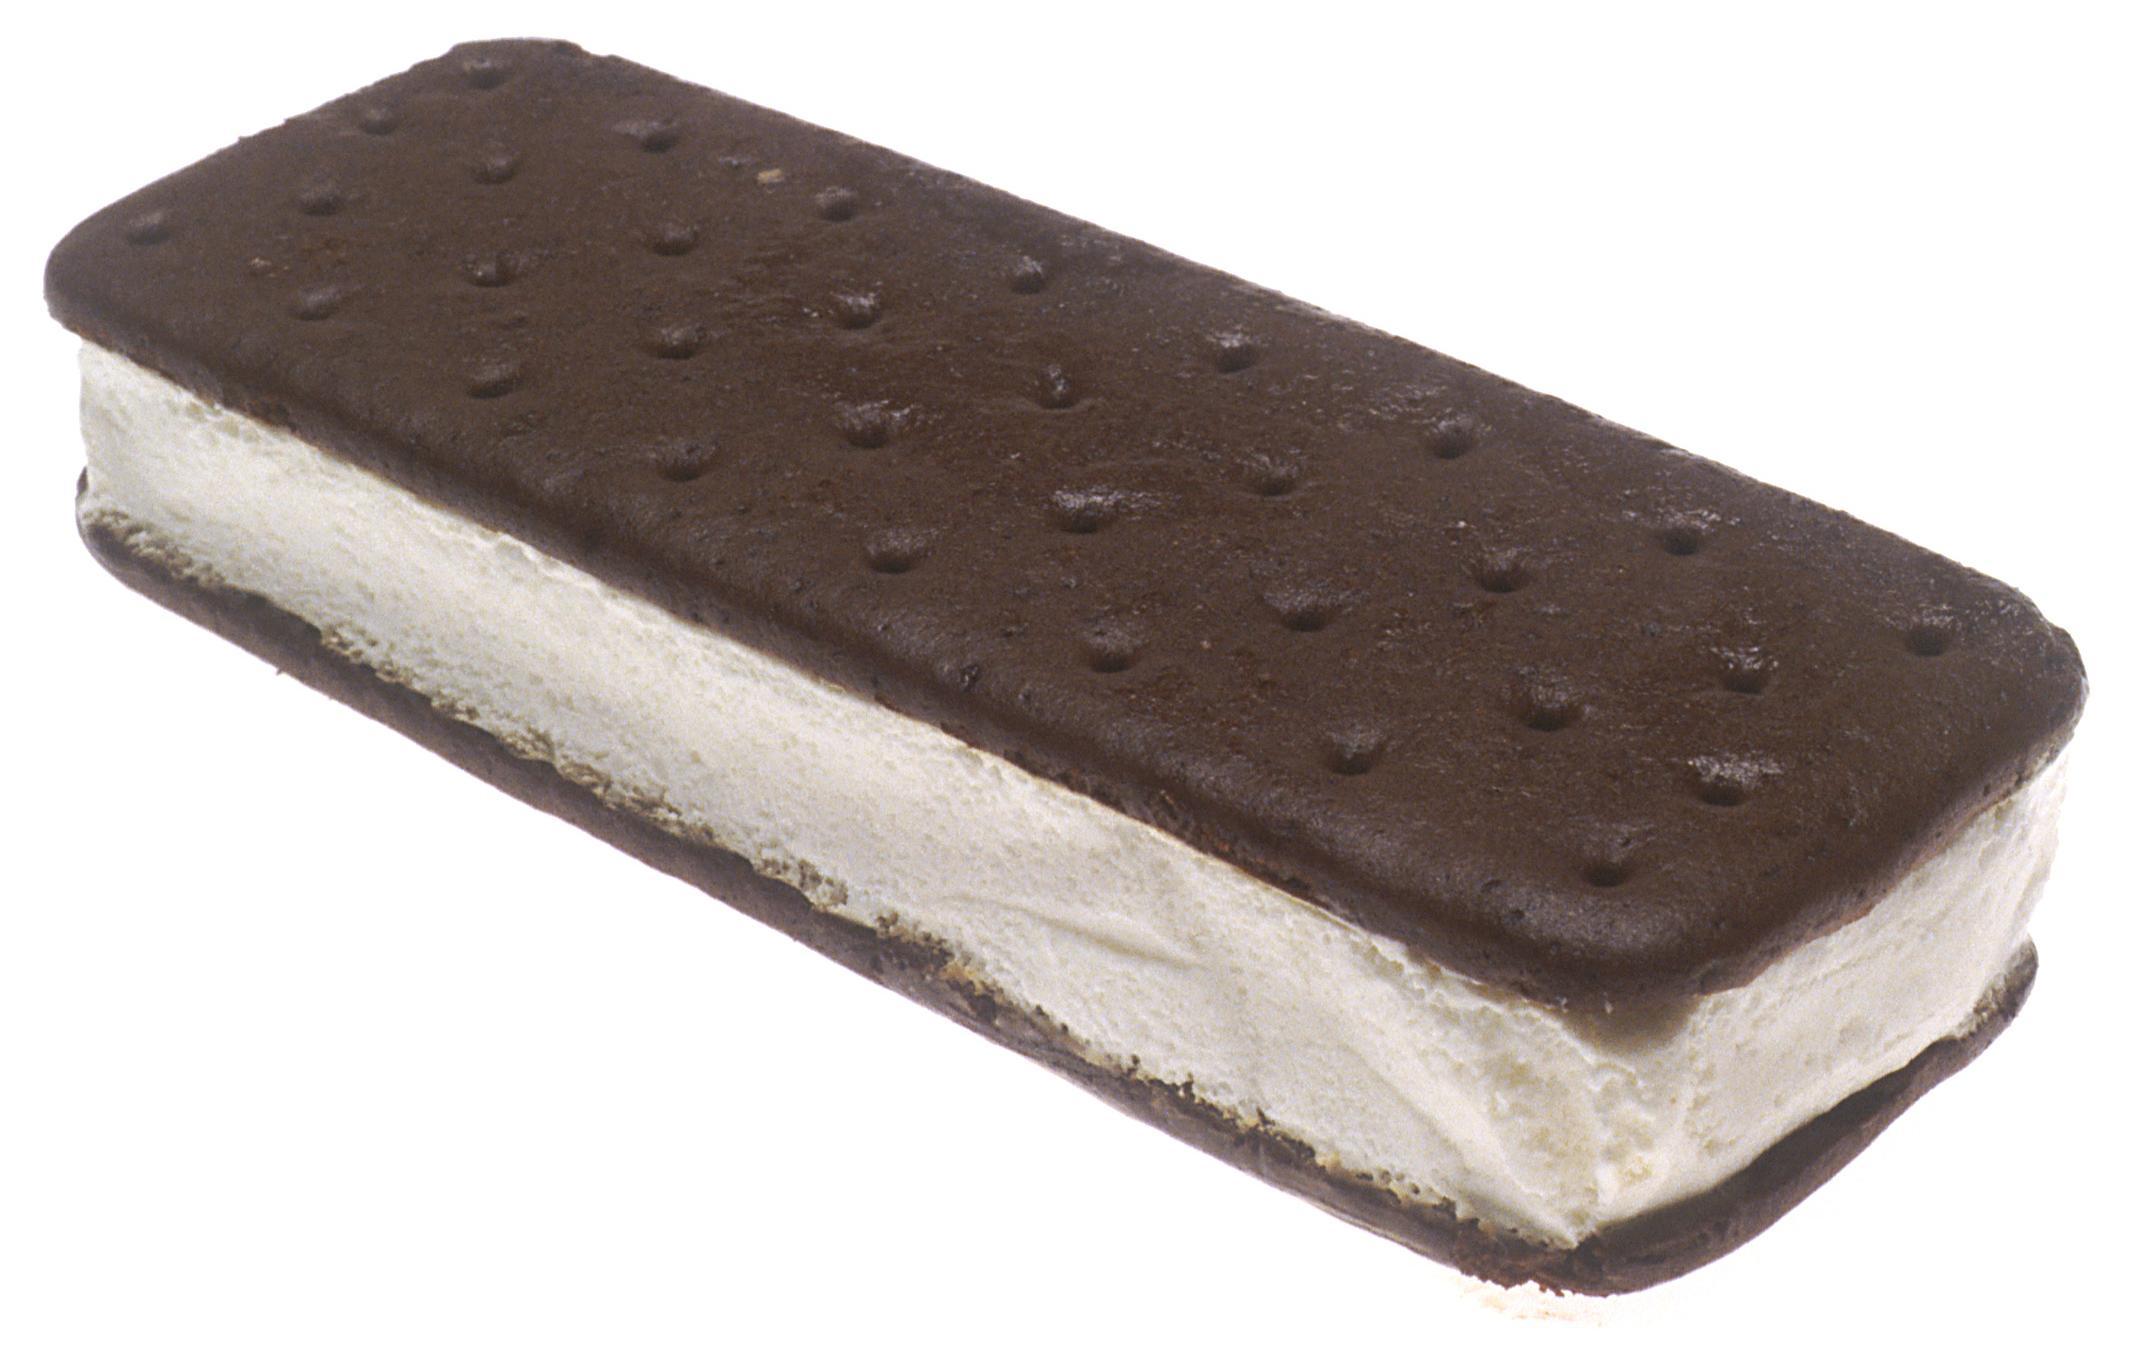 IceCreamSandwich.jpg